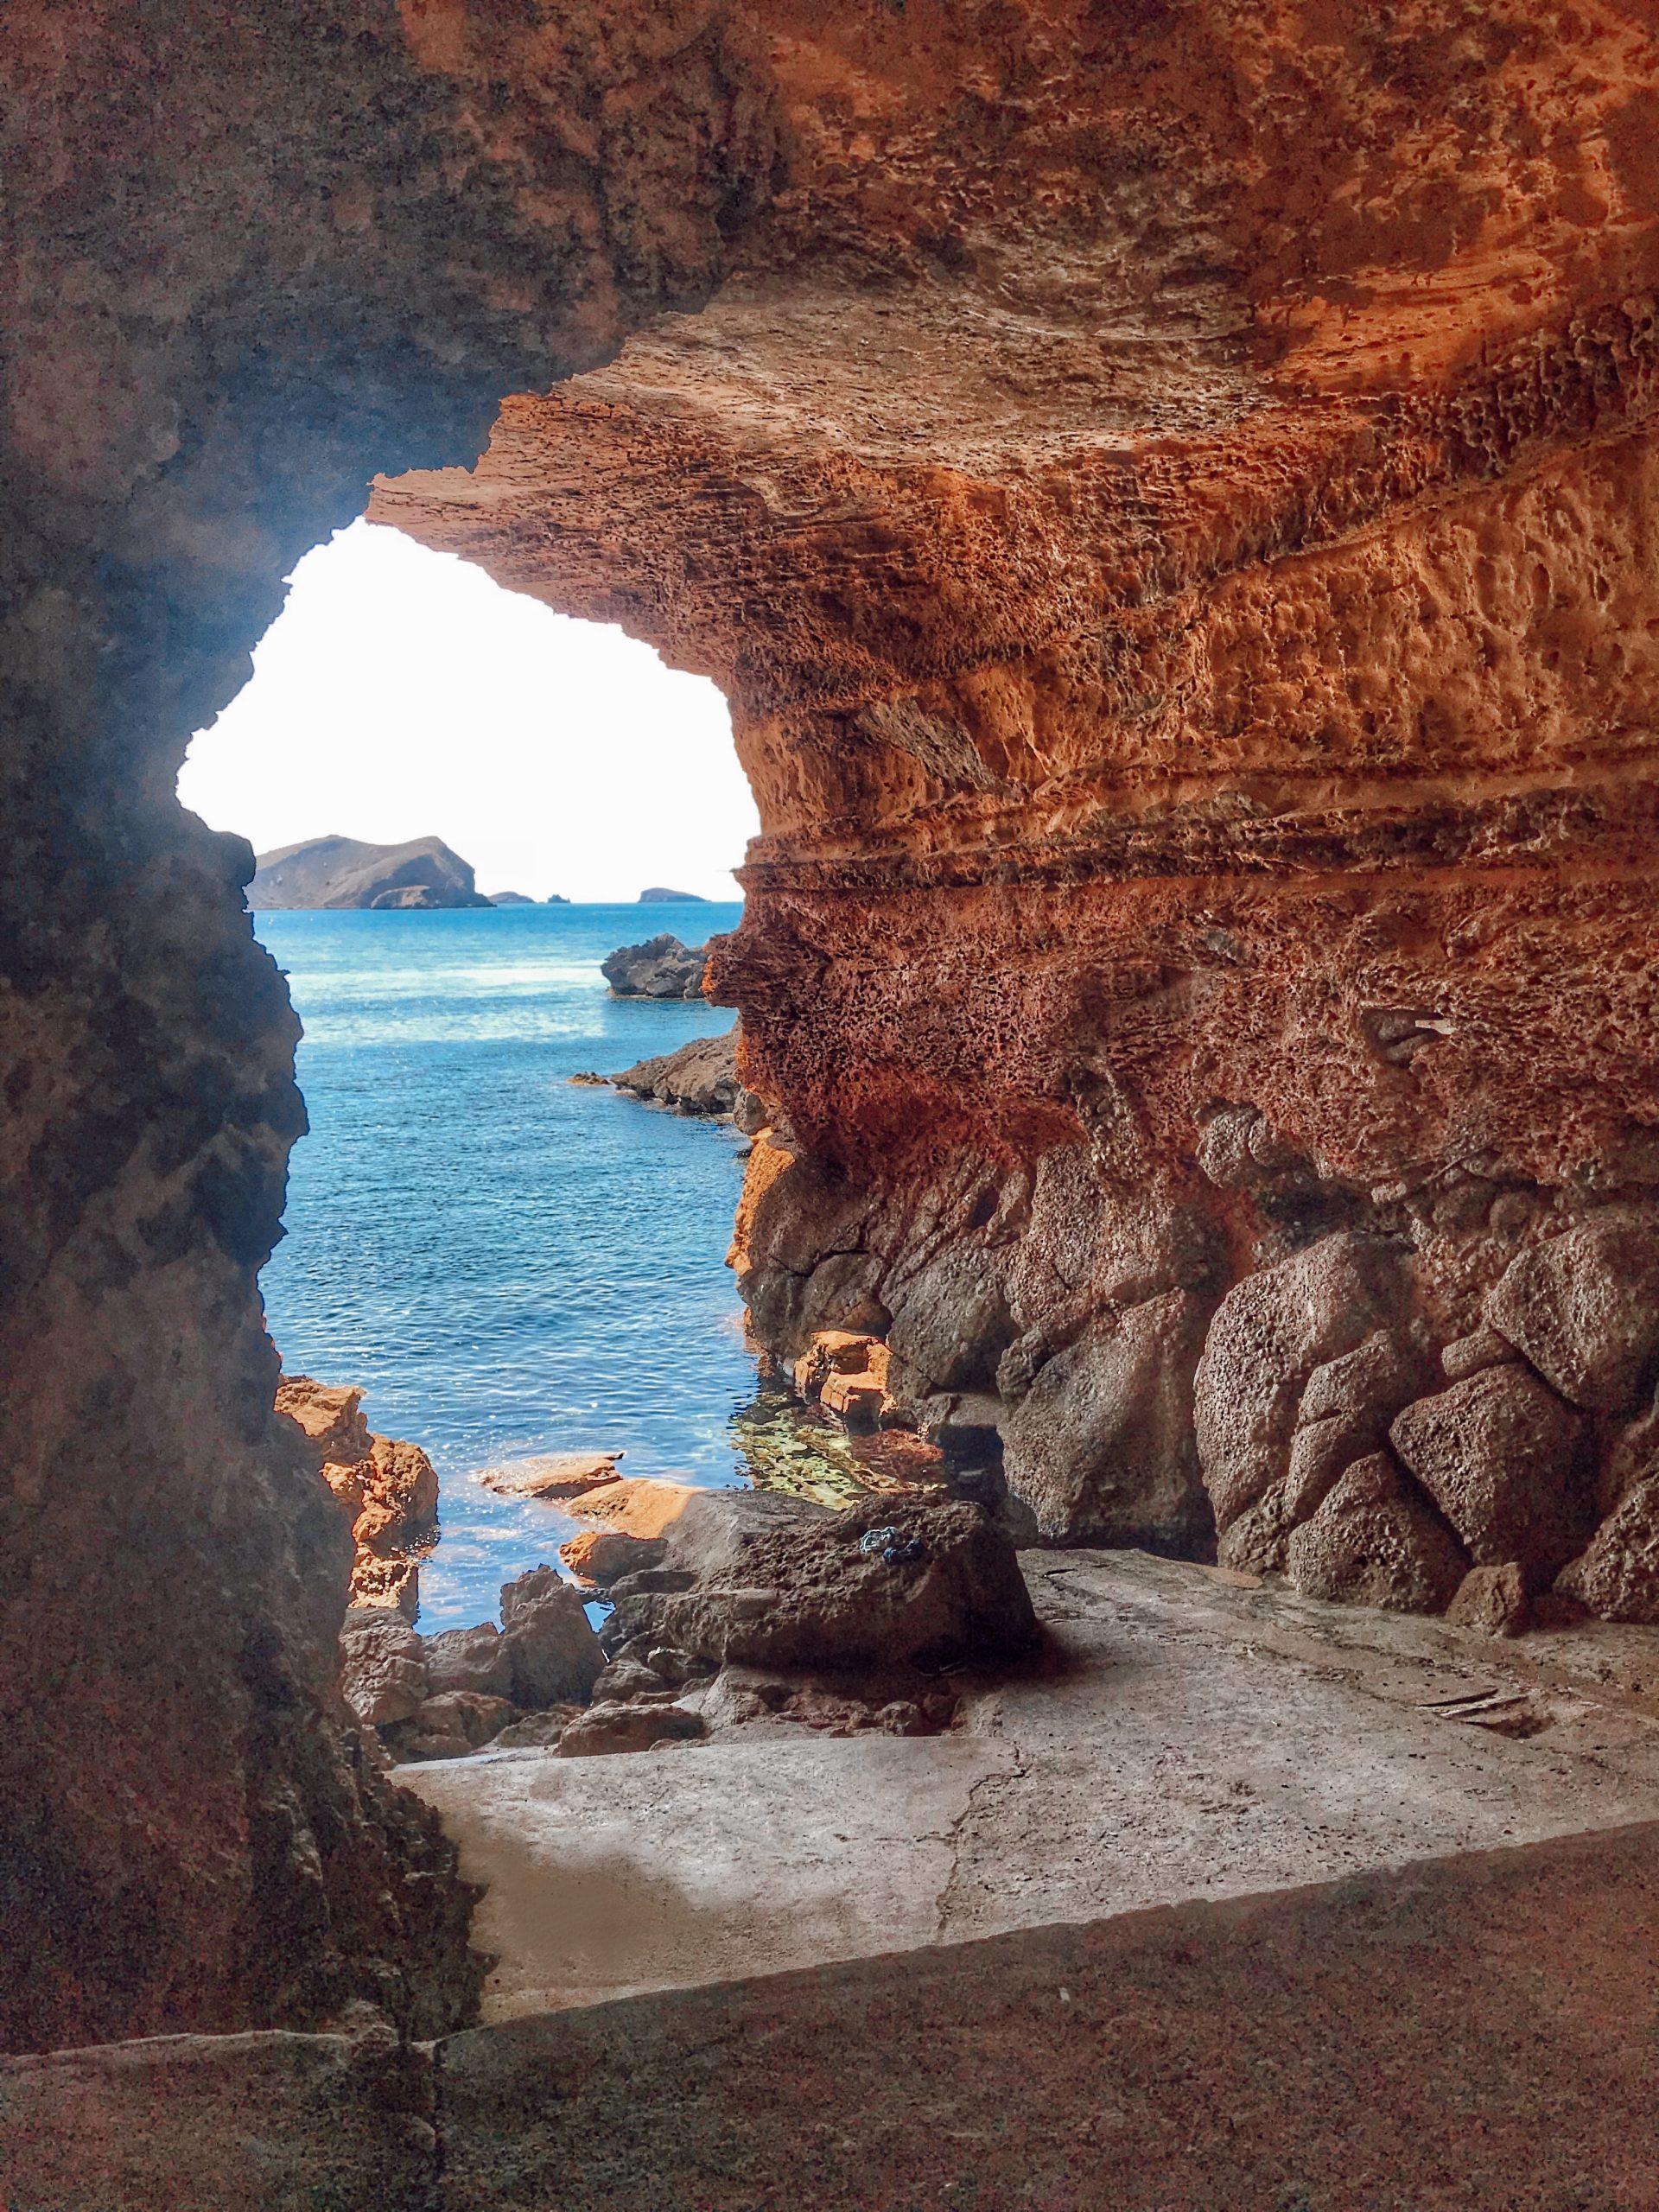 Cueva Sa Figuera Borda by Ibizaplus